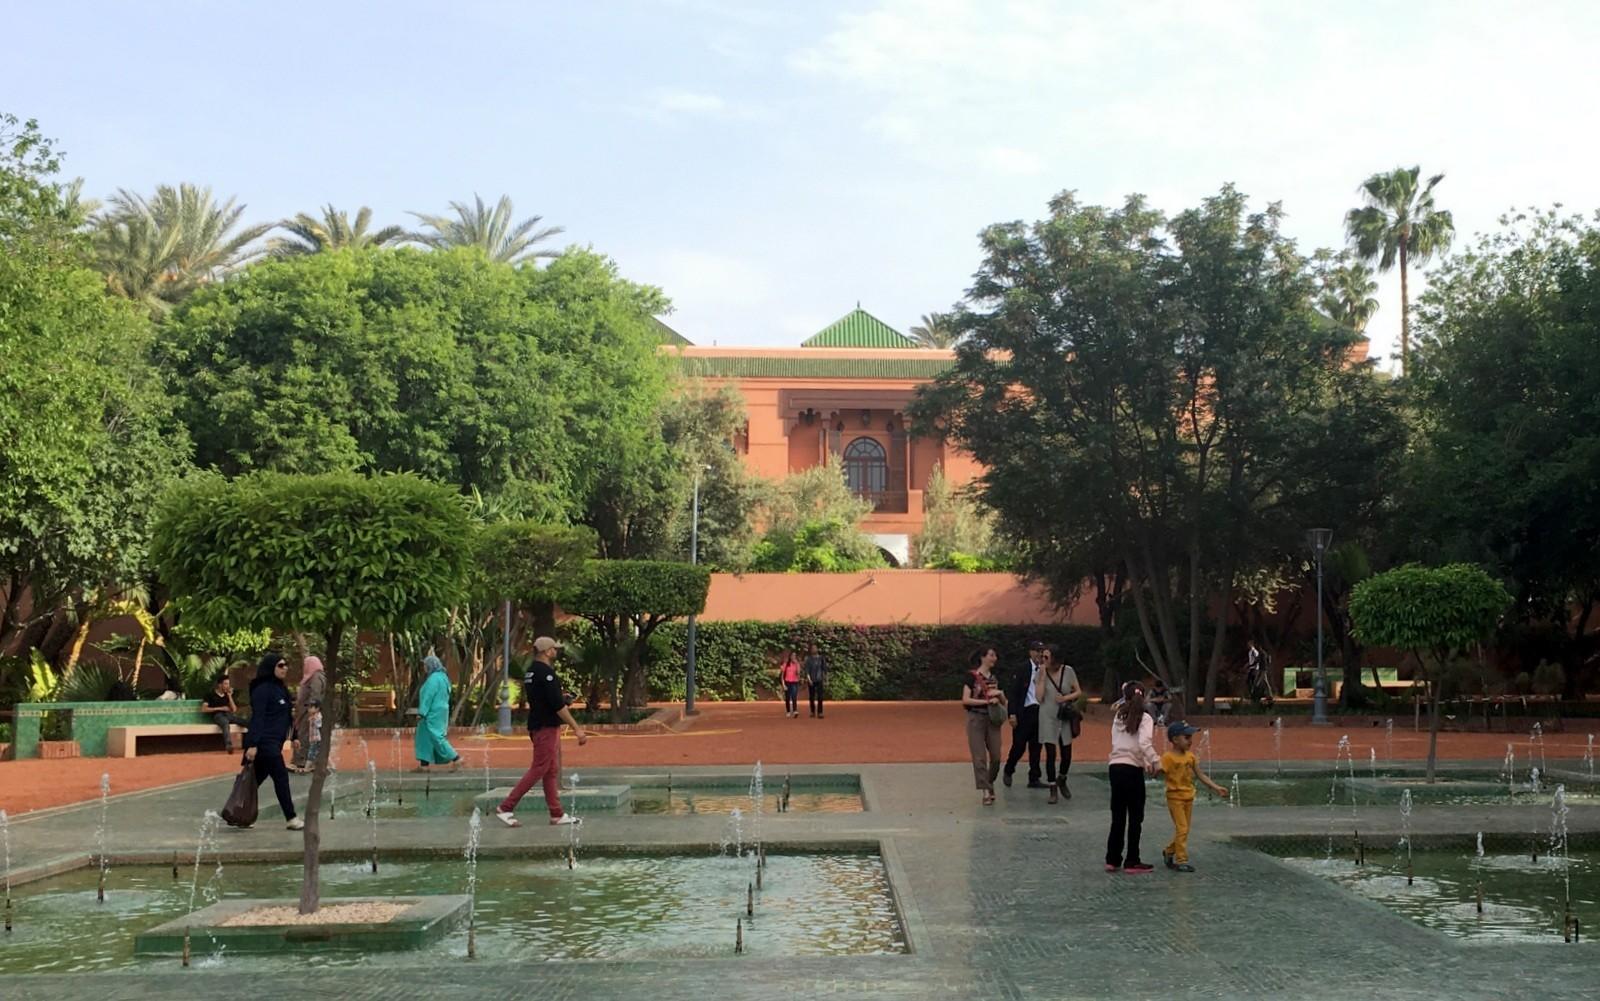 Cyberpark Marrakesh